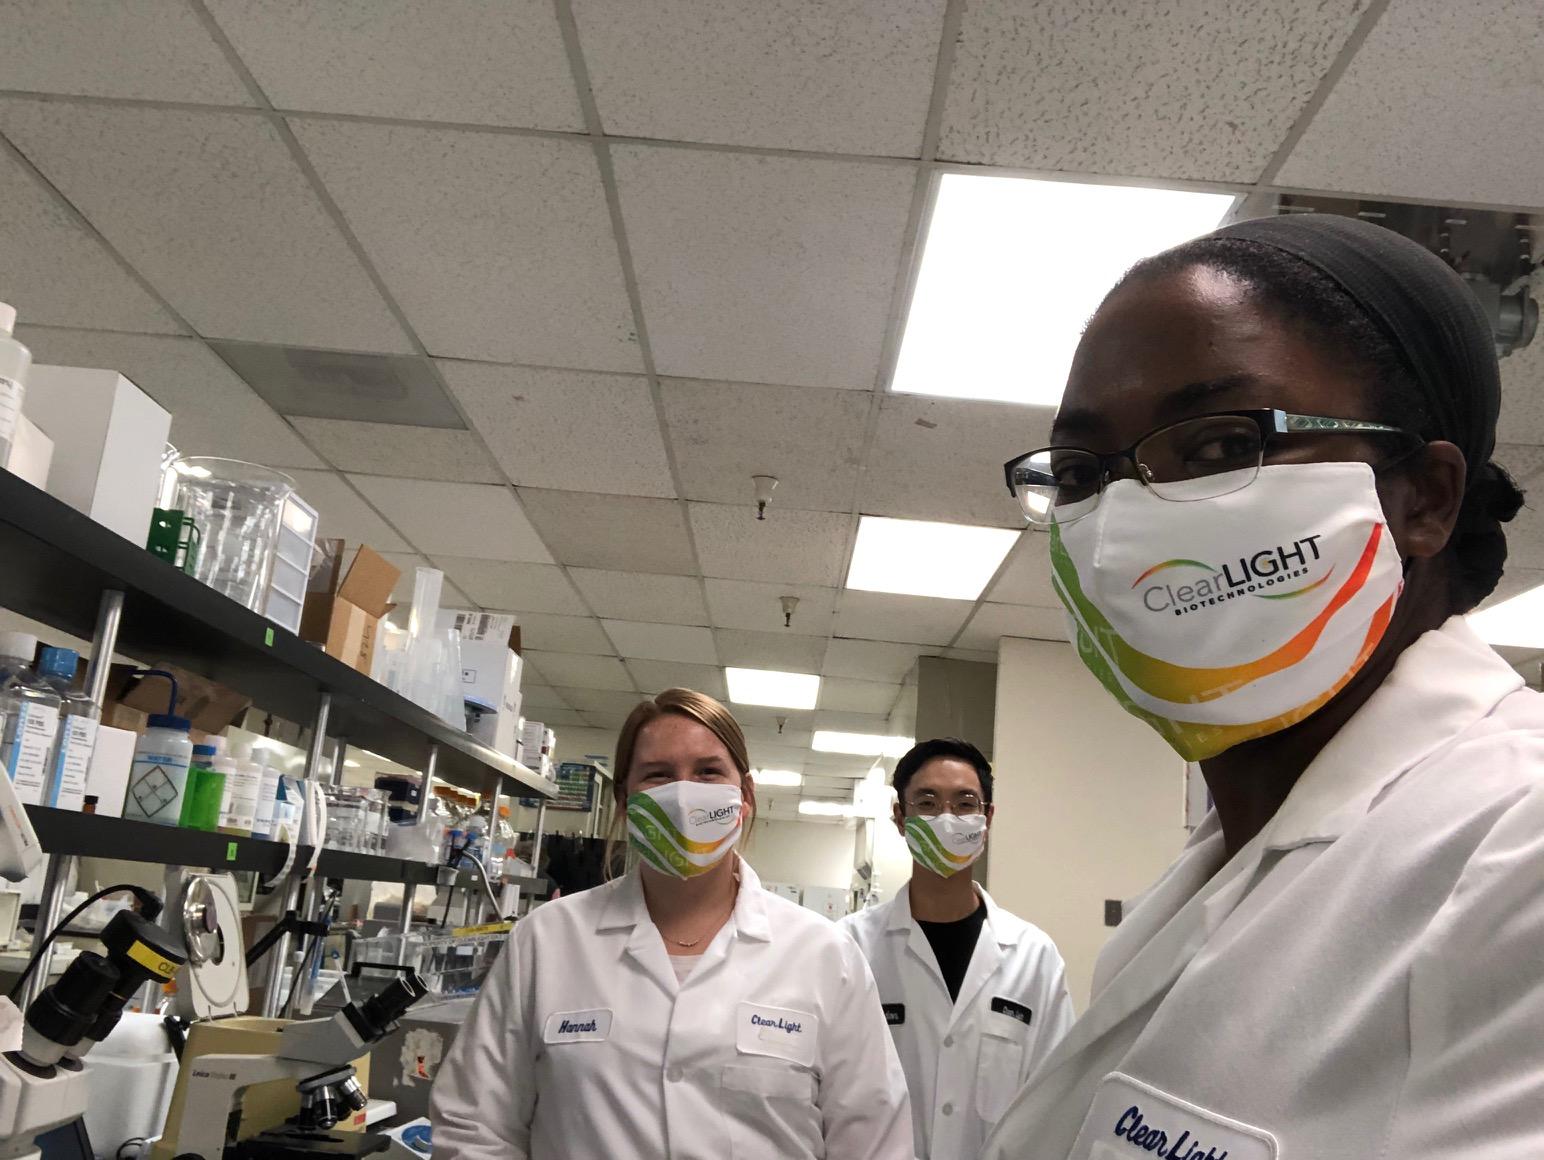 Dr. Sharla White and Team